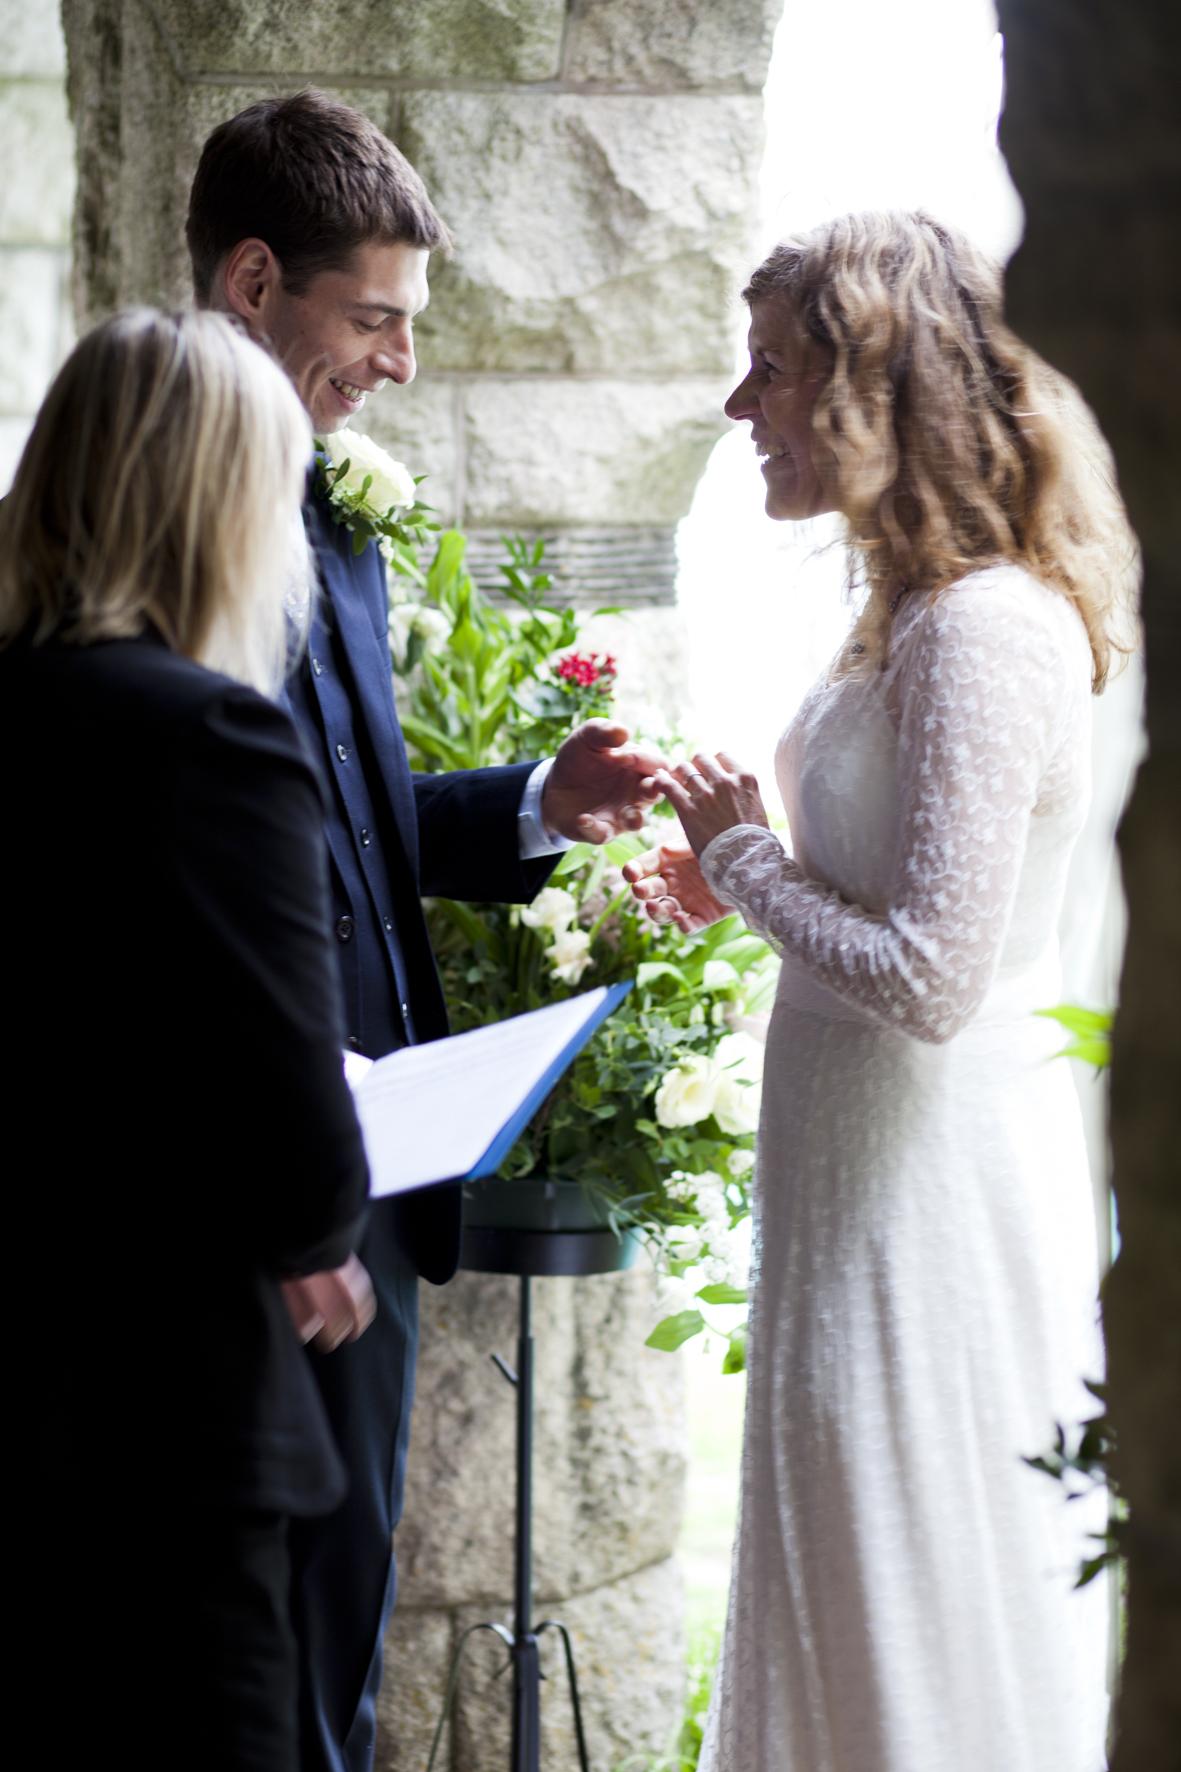 Wedding example_M&P__MG_3420_Claudia Leisinger.jpg